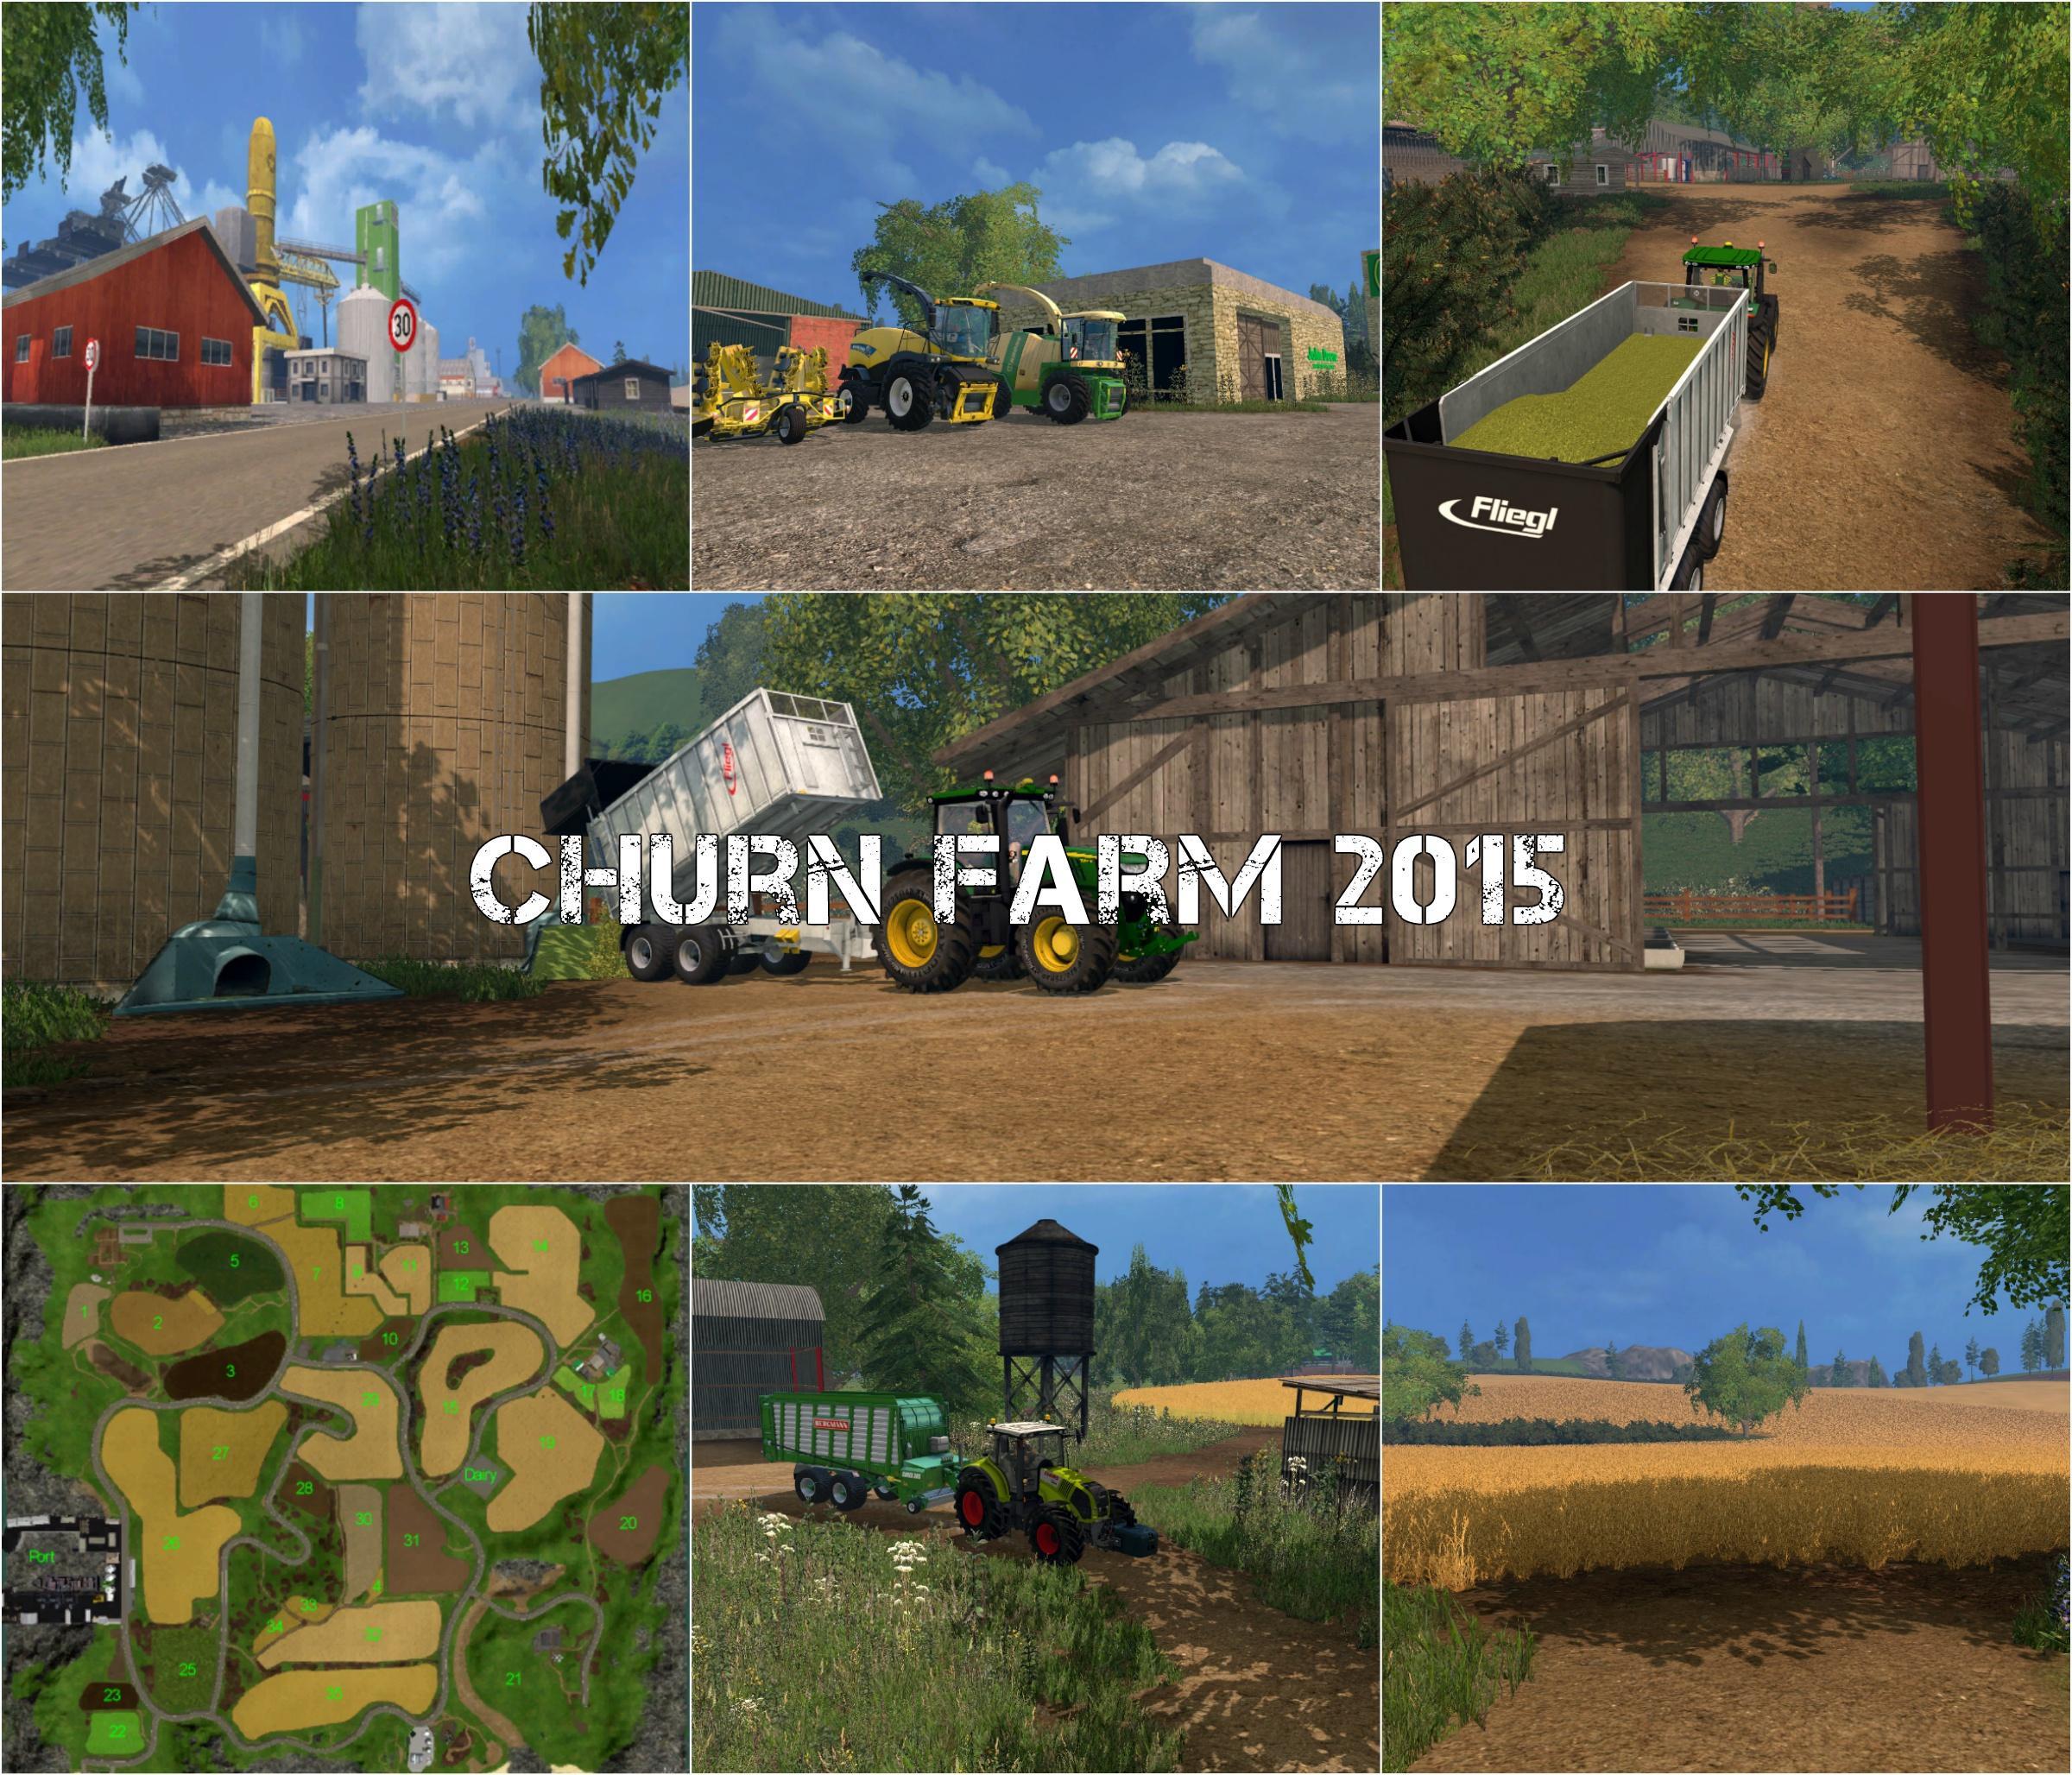 churn-farm-2015_1